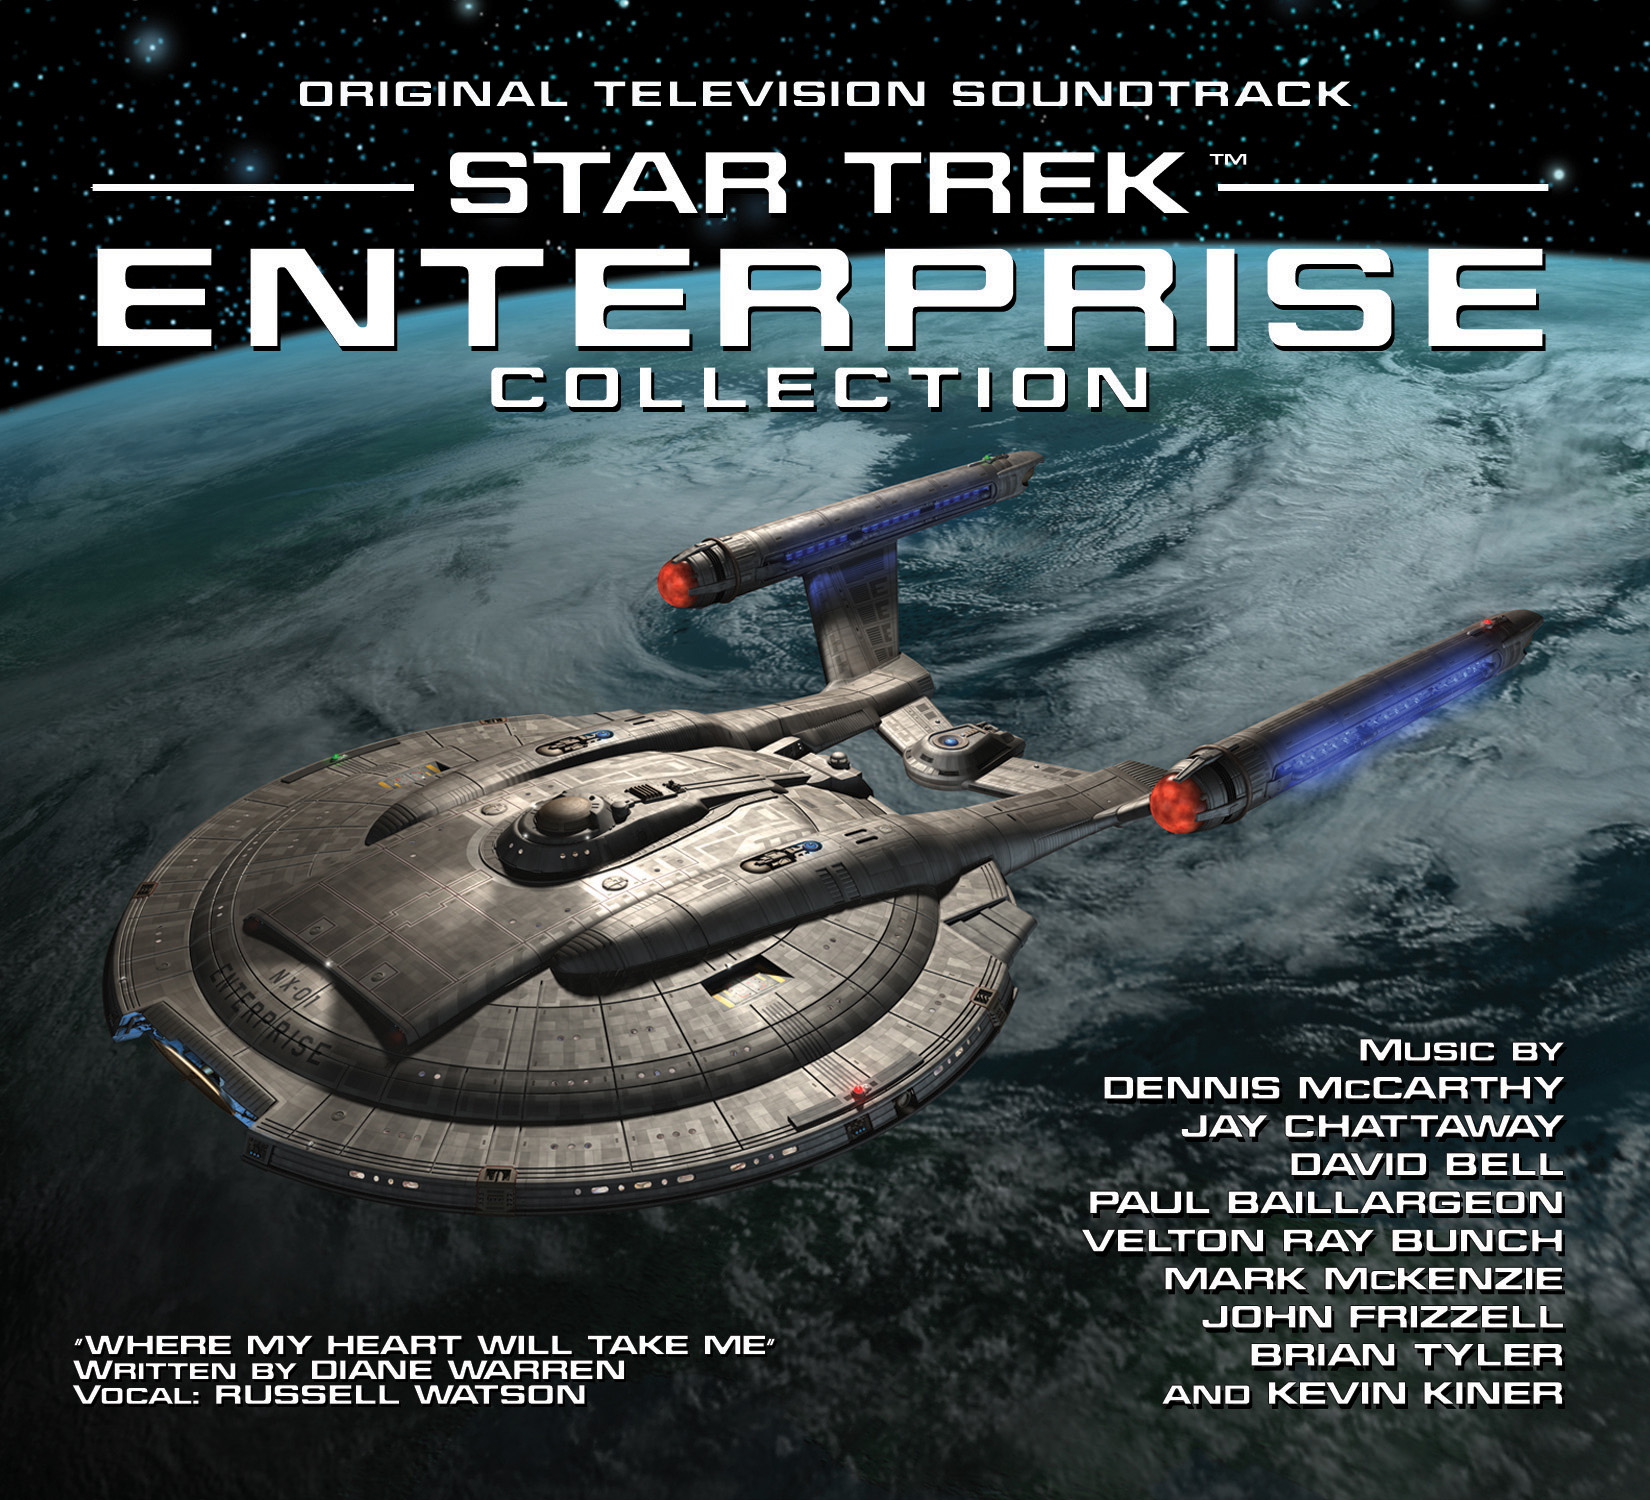 Star Trek: Enterprise Collection